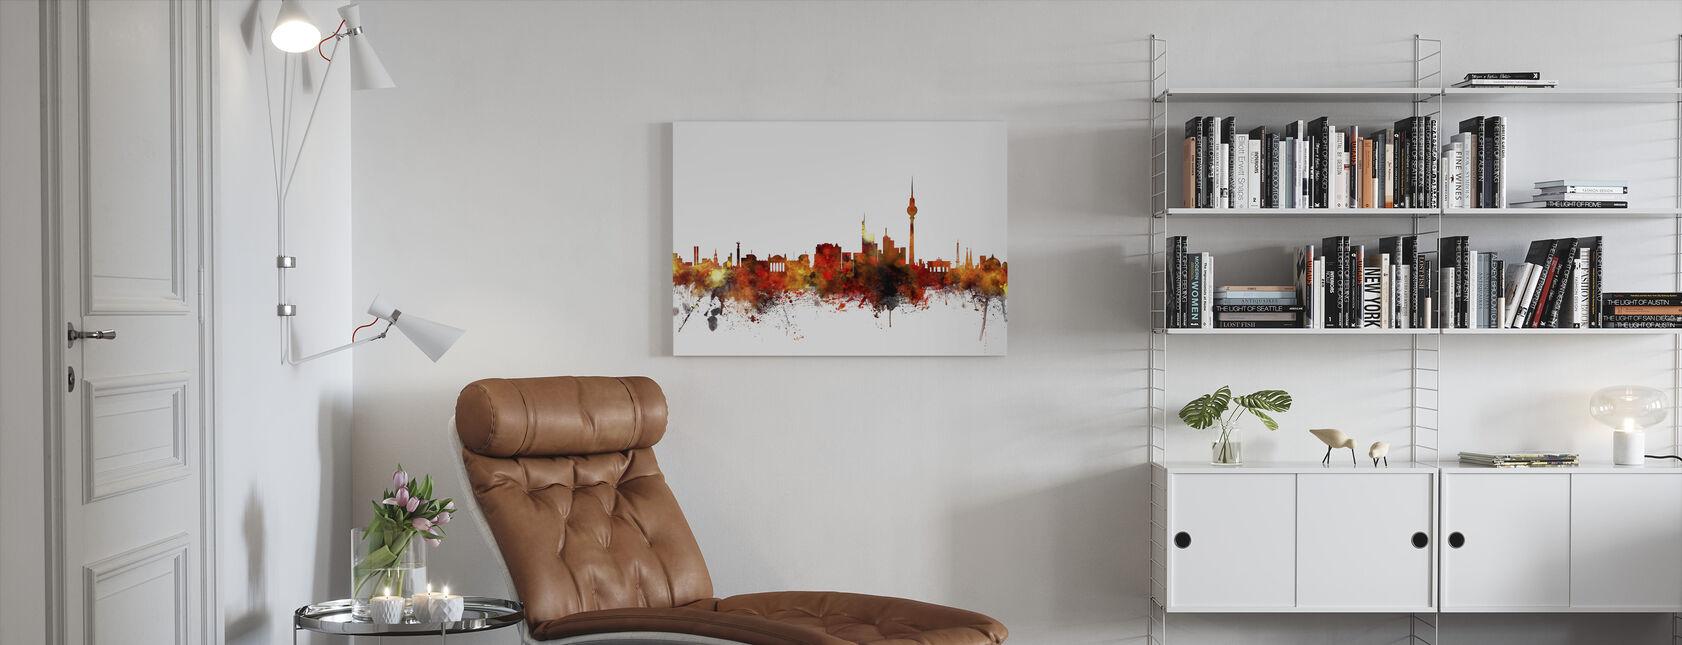 Berlin Skyline 2 - Canvas print - Living Room